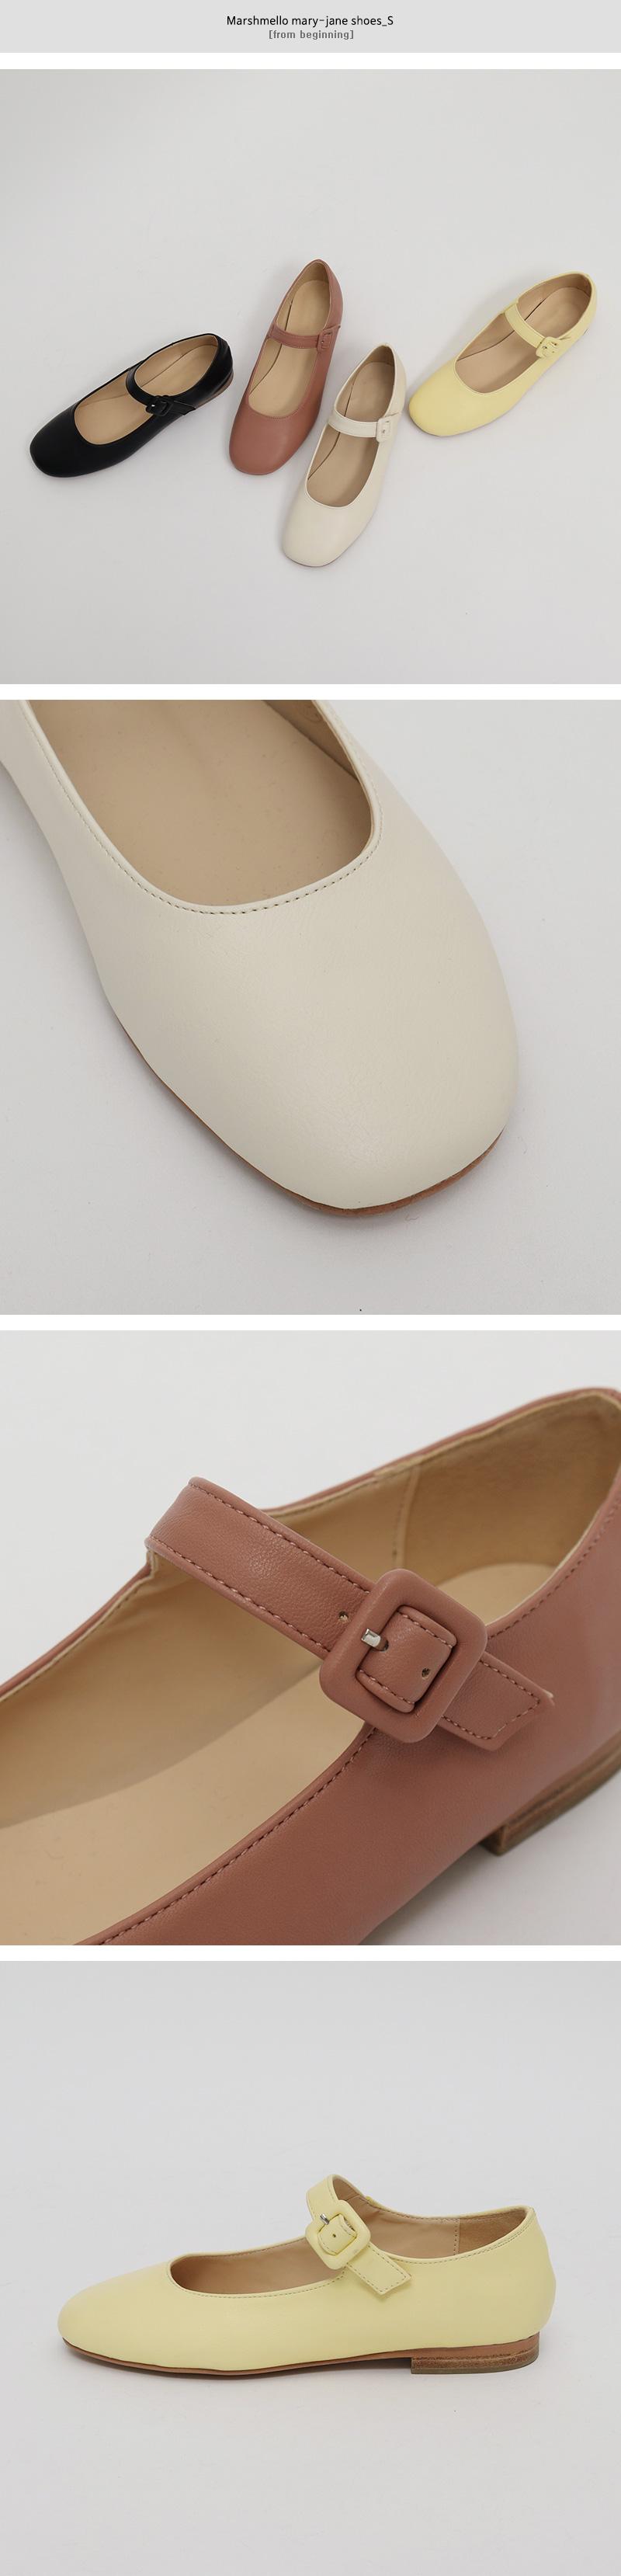 Marshmello mary-jane shoes_S